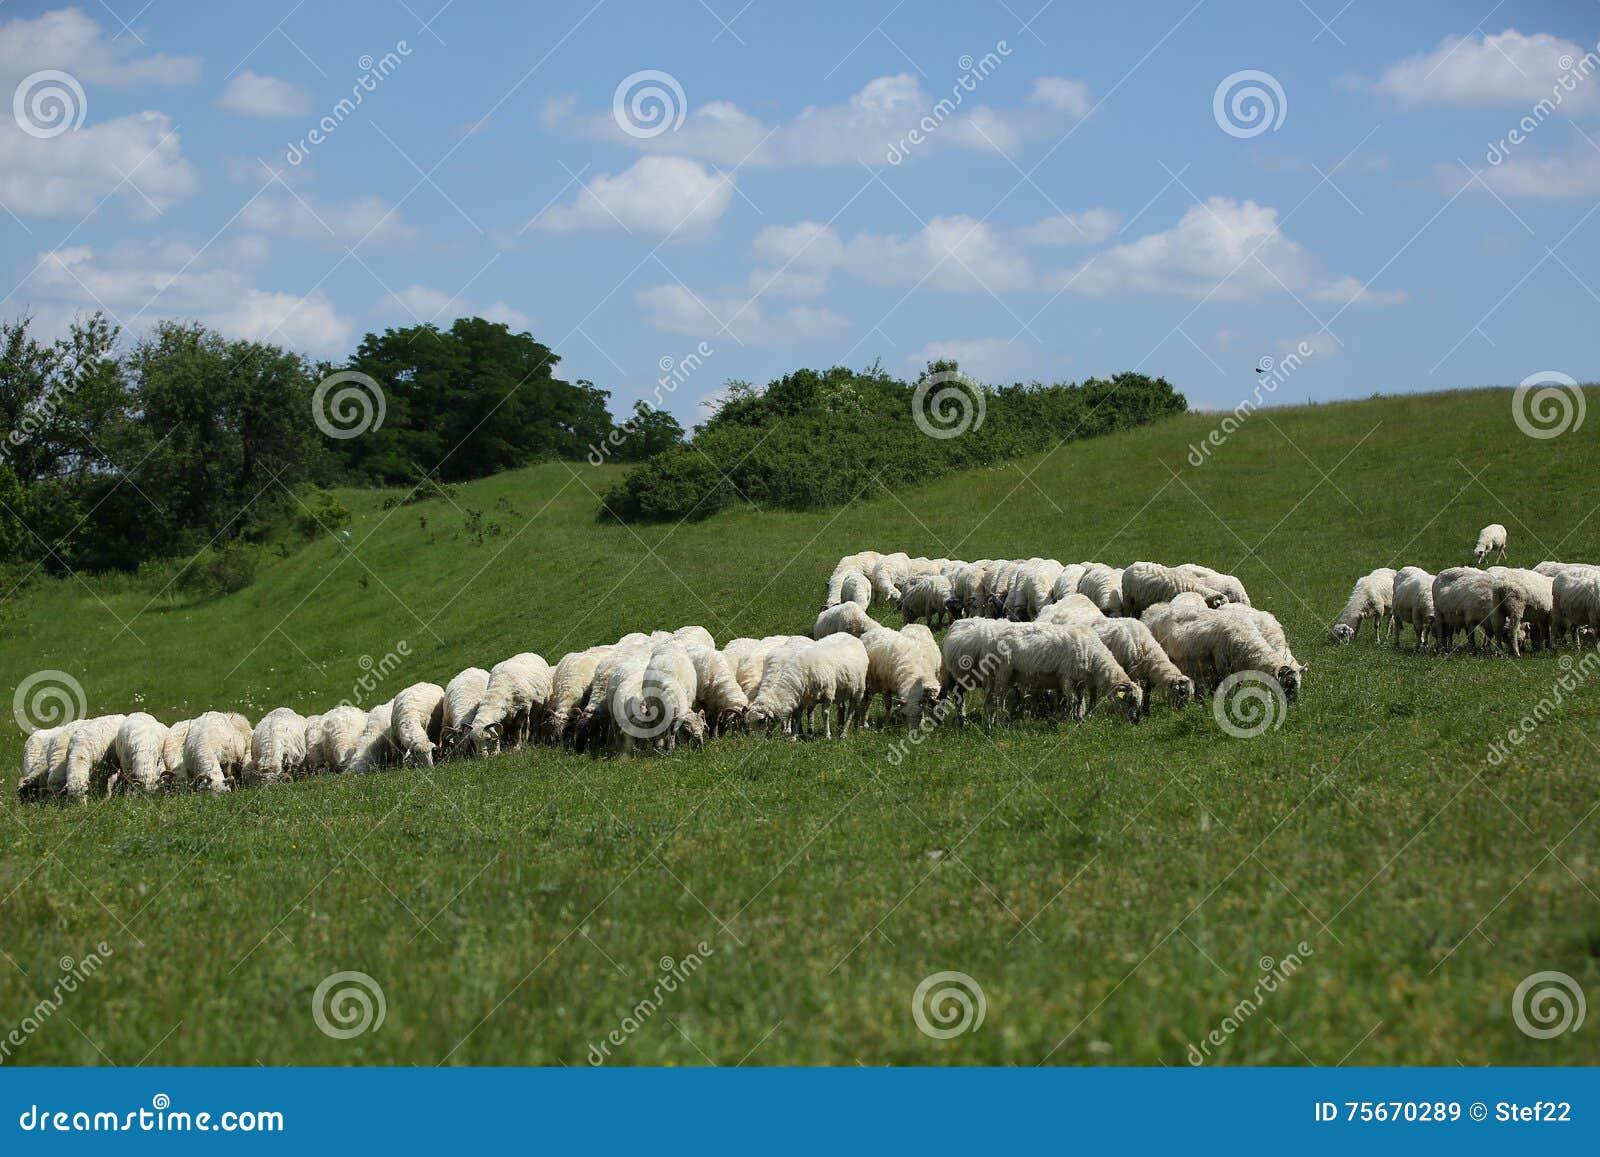 Download Flock of sheep grazing stock image. Image of farming - 75670289